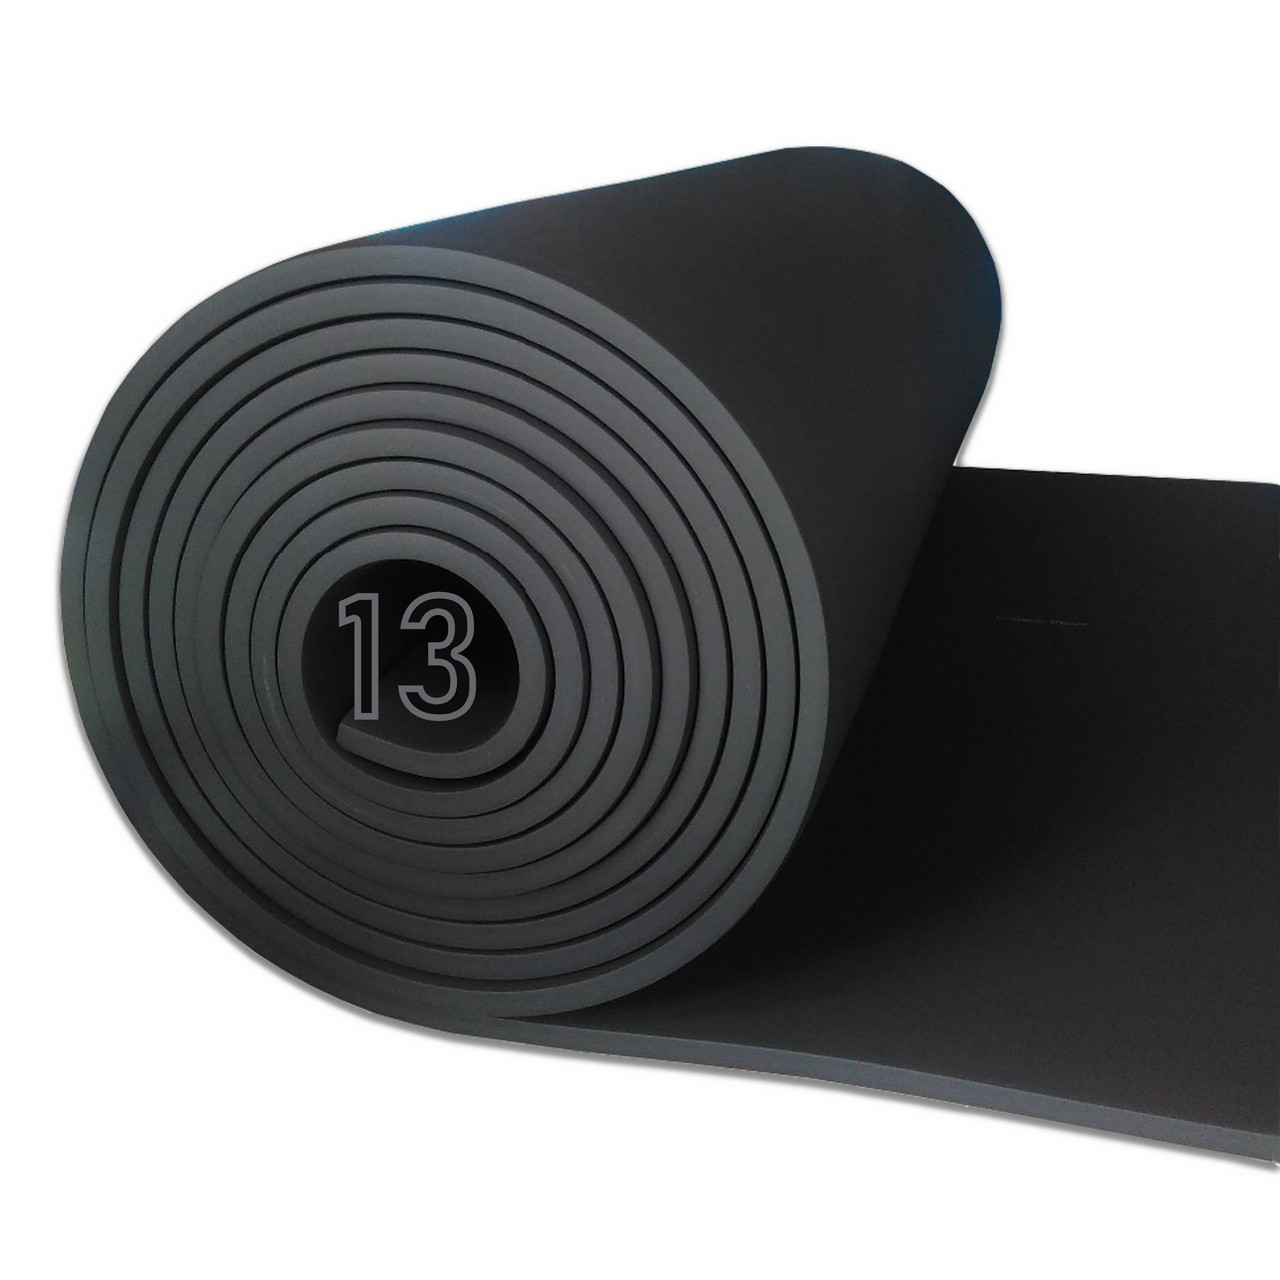 Вспененный каучук 13 мм цена за рулон